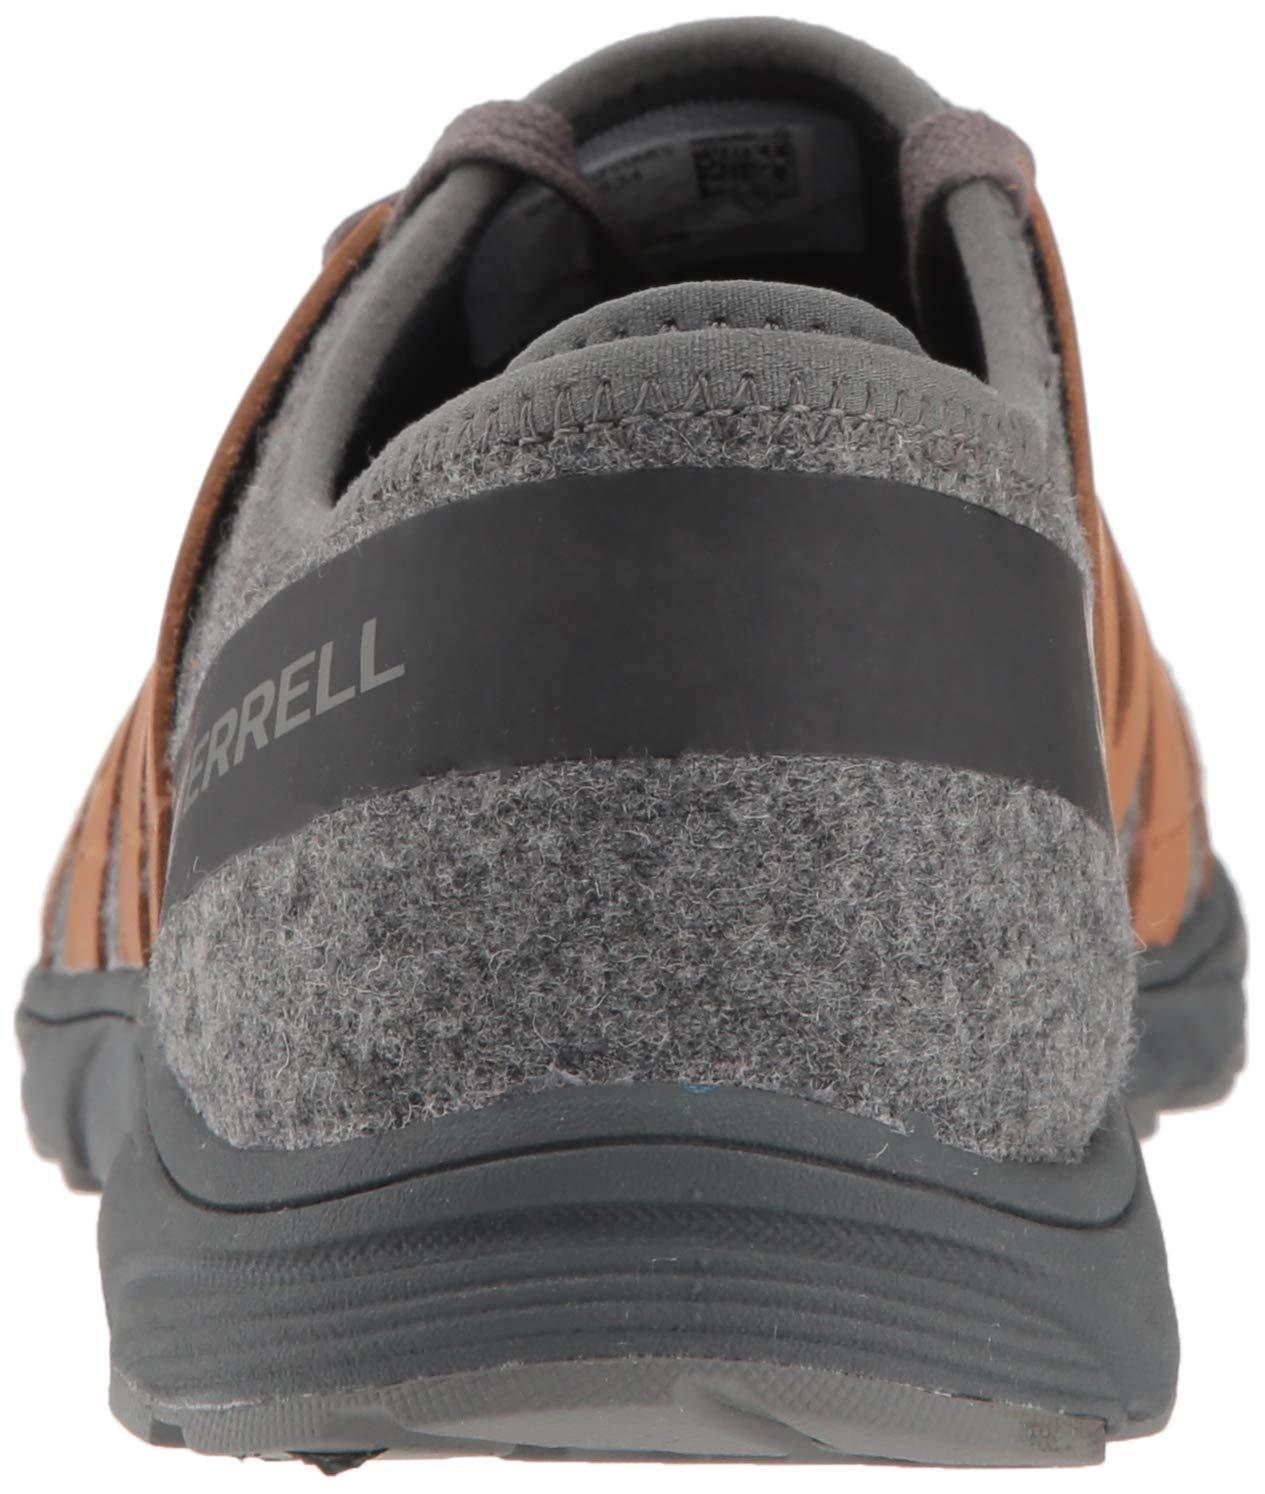 Merrell Women's Riveter Wool Sneaker B079DG8CVH 10 M US Charcoal